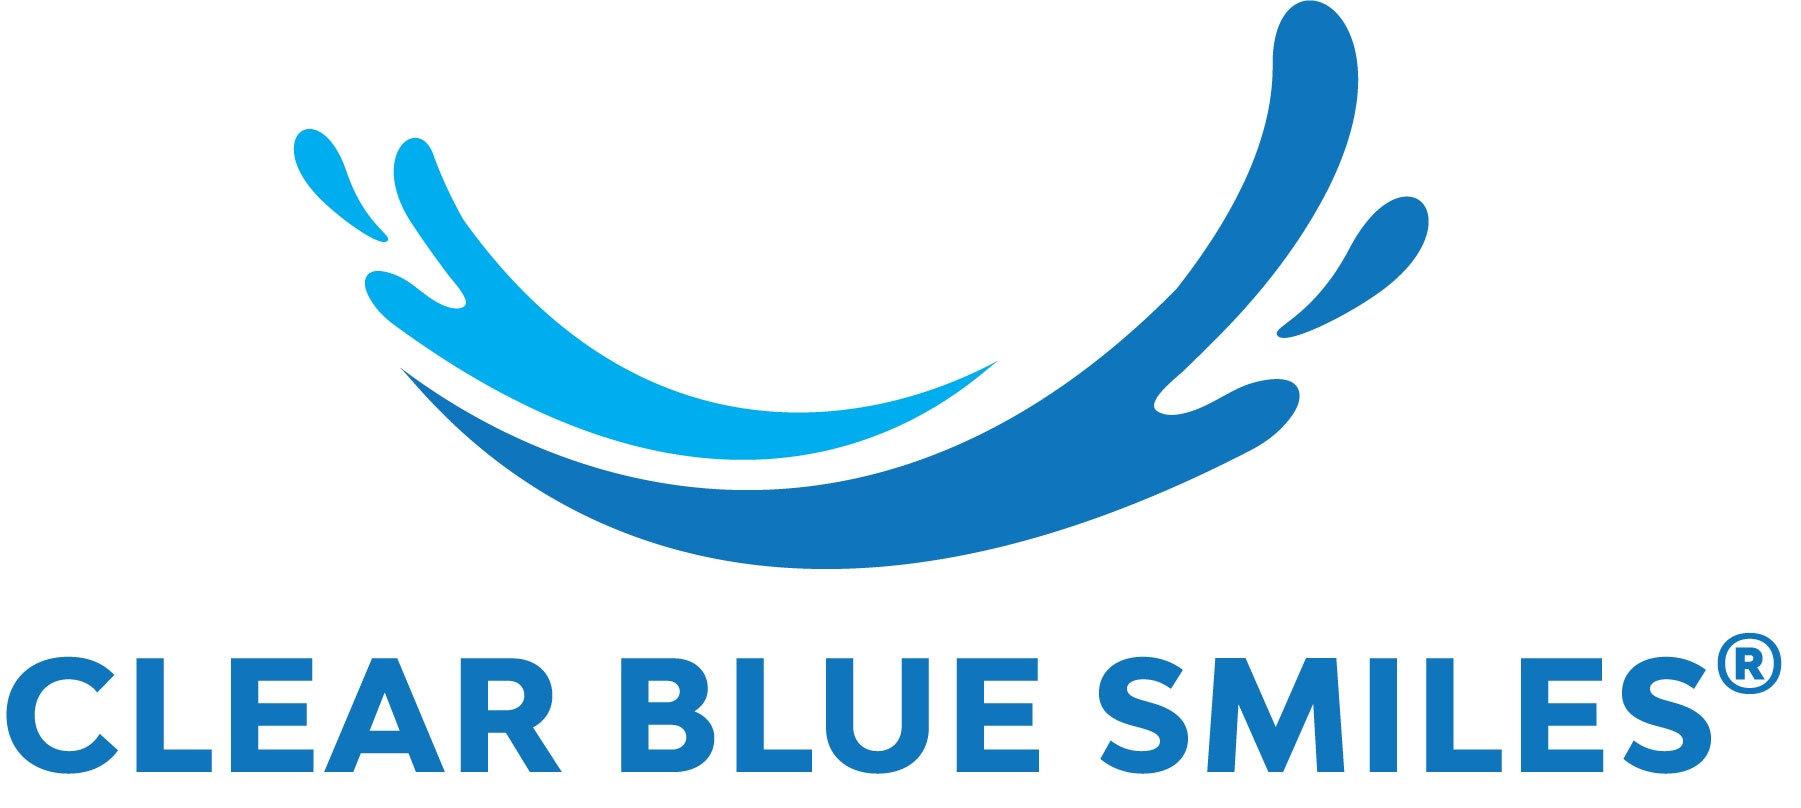 Clear Blue Smiles Ocean Blue Cleanup Sponsor